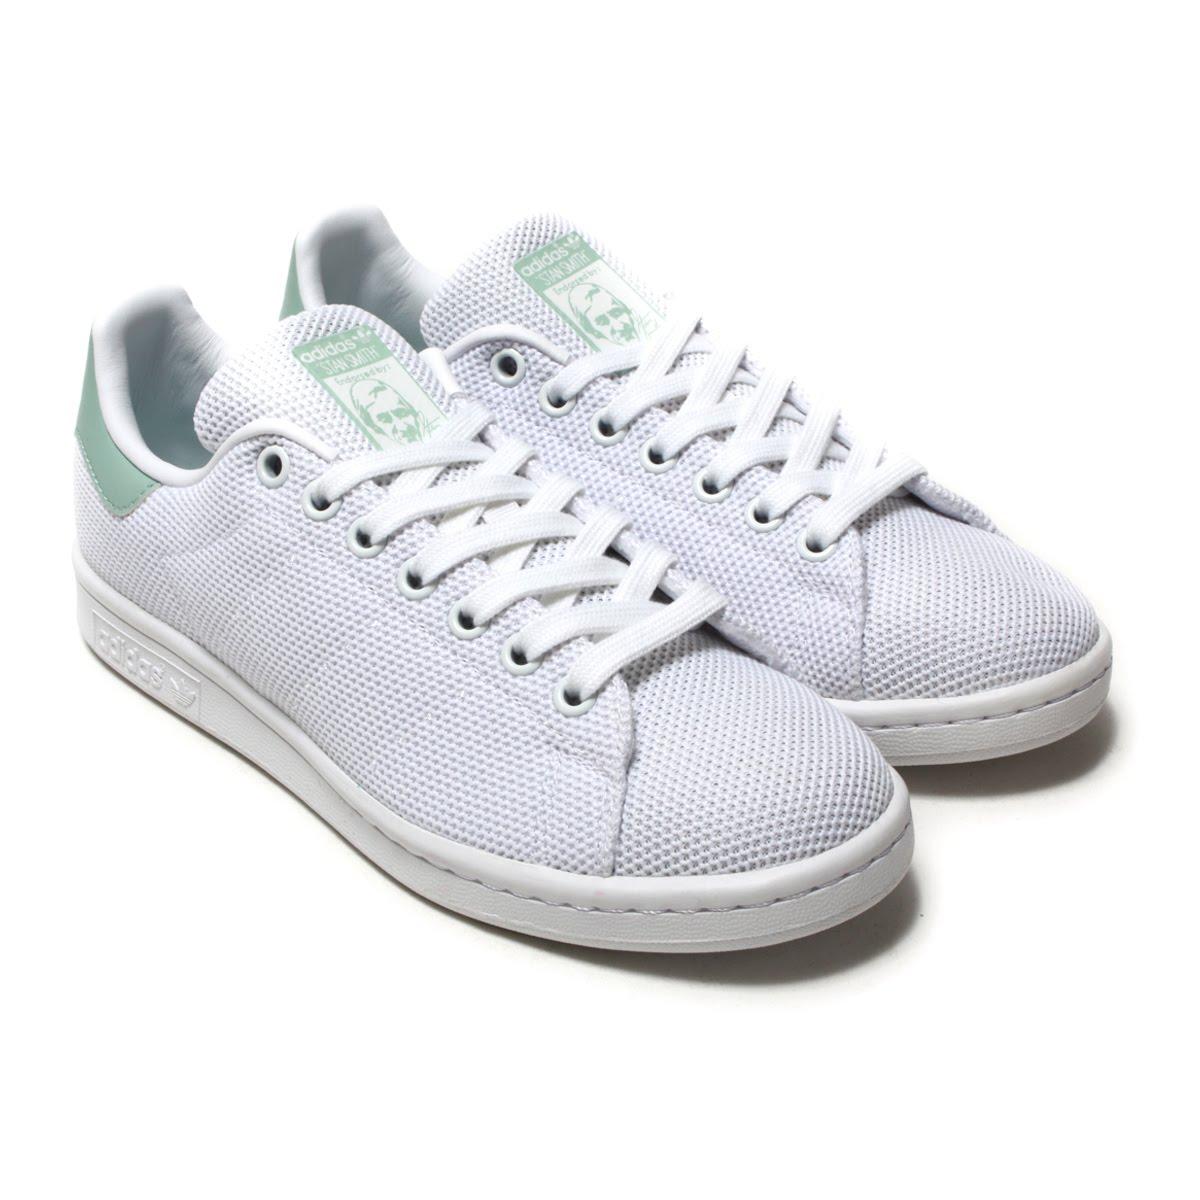 adidas Originals STAN SMITH W(アディダス オリジナルス スタンスミス W)Running White/Running White/Ash Green【メンズ レディース スニーカー】18SS-I